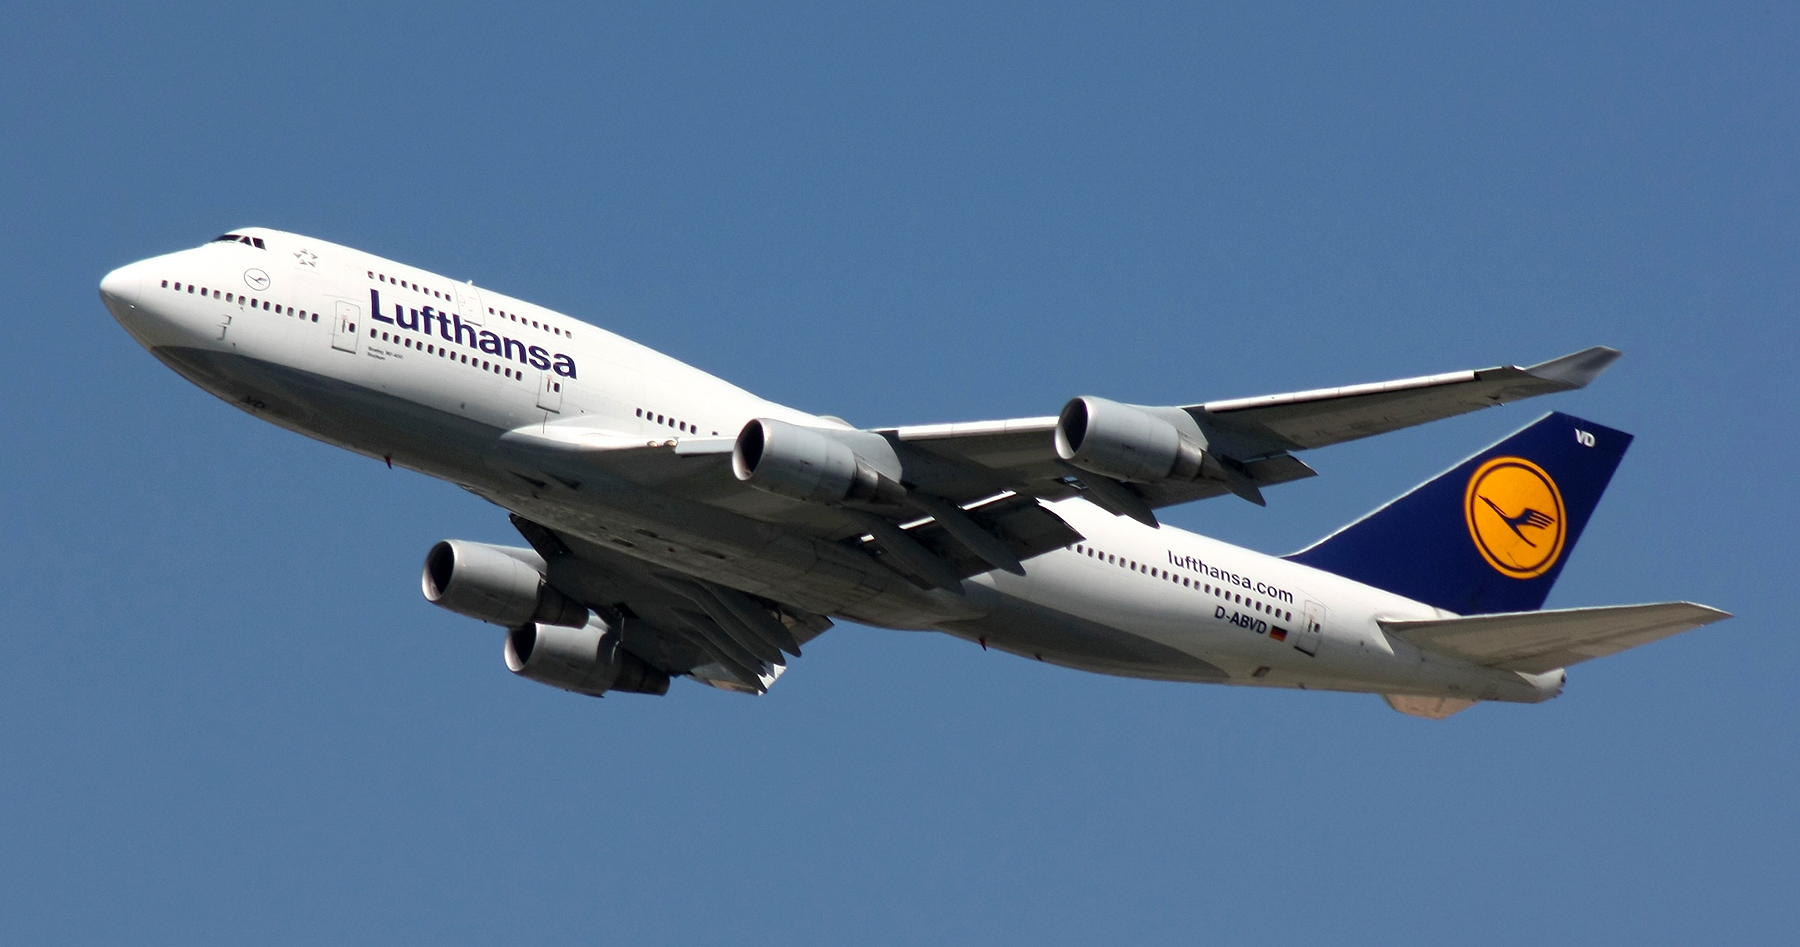 Lufthansa B744 D-ABVD